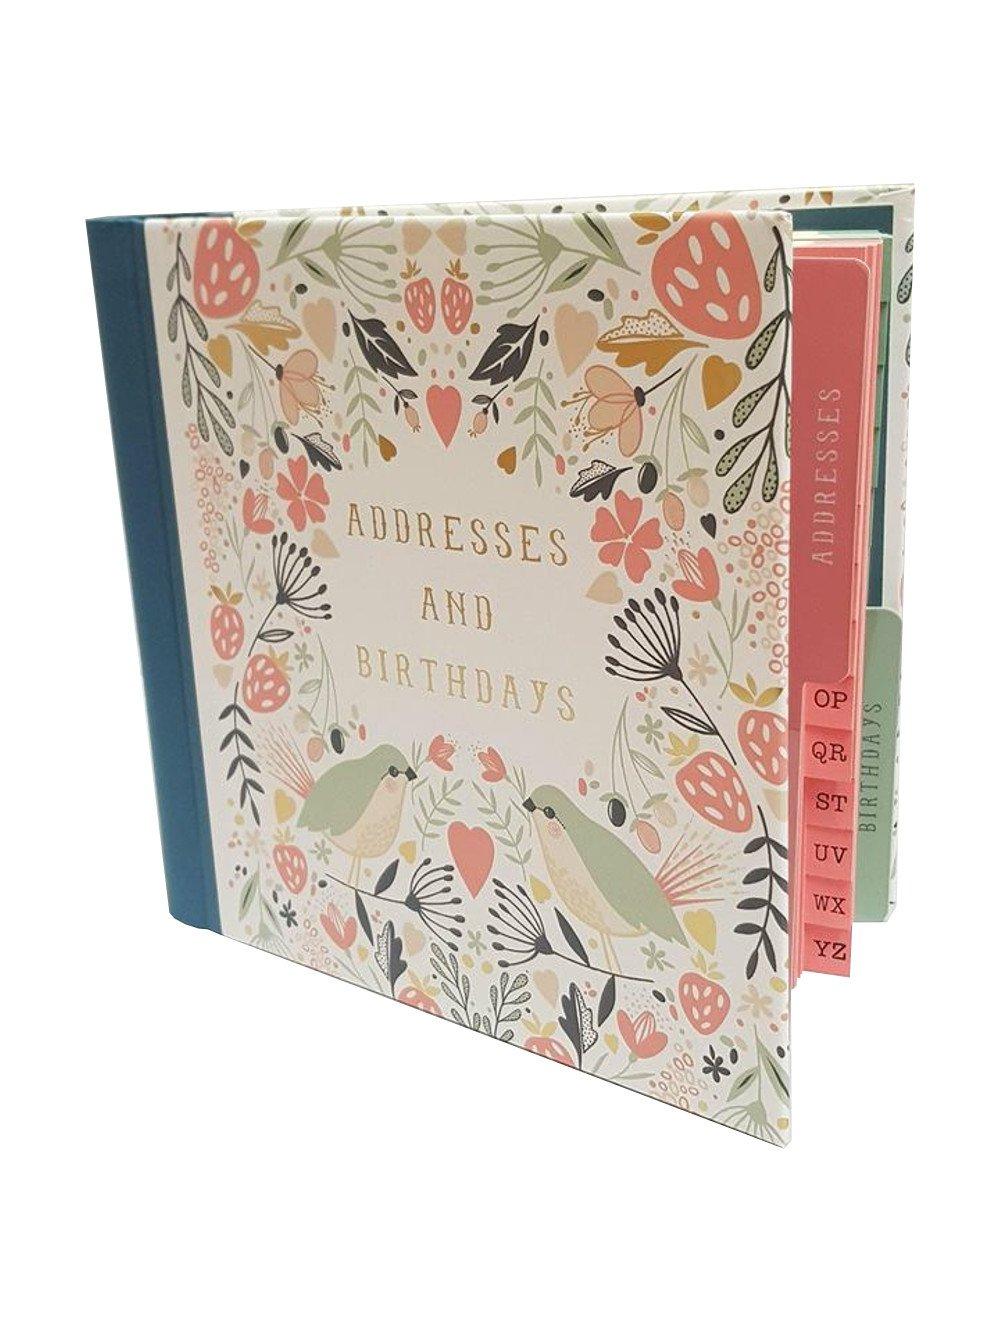 Art File Wild Berry Address & Birthday Card Book